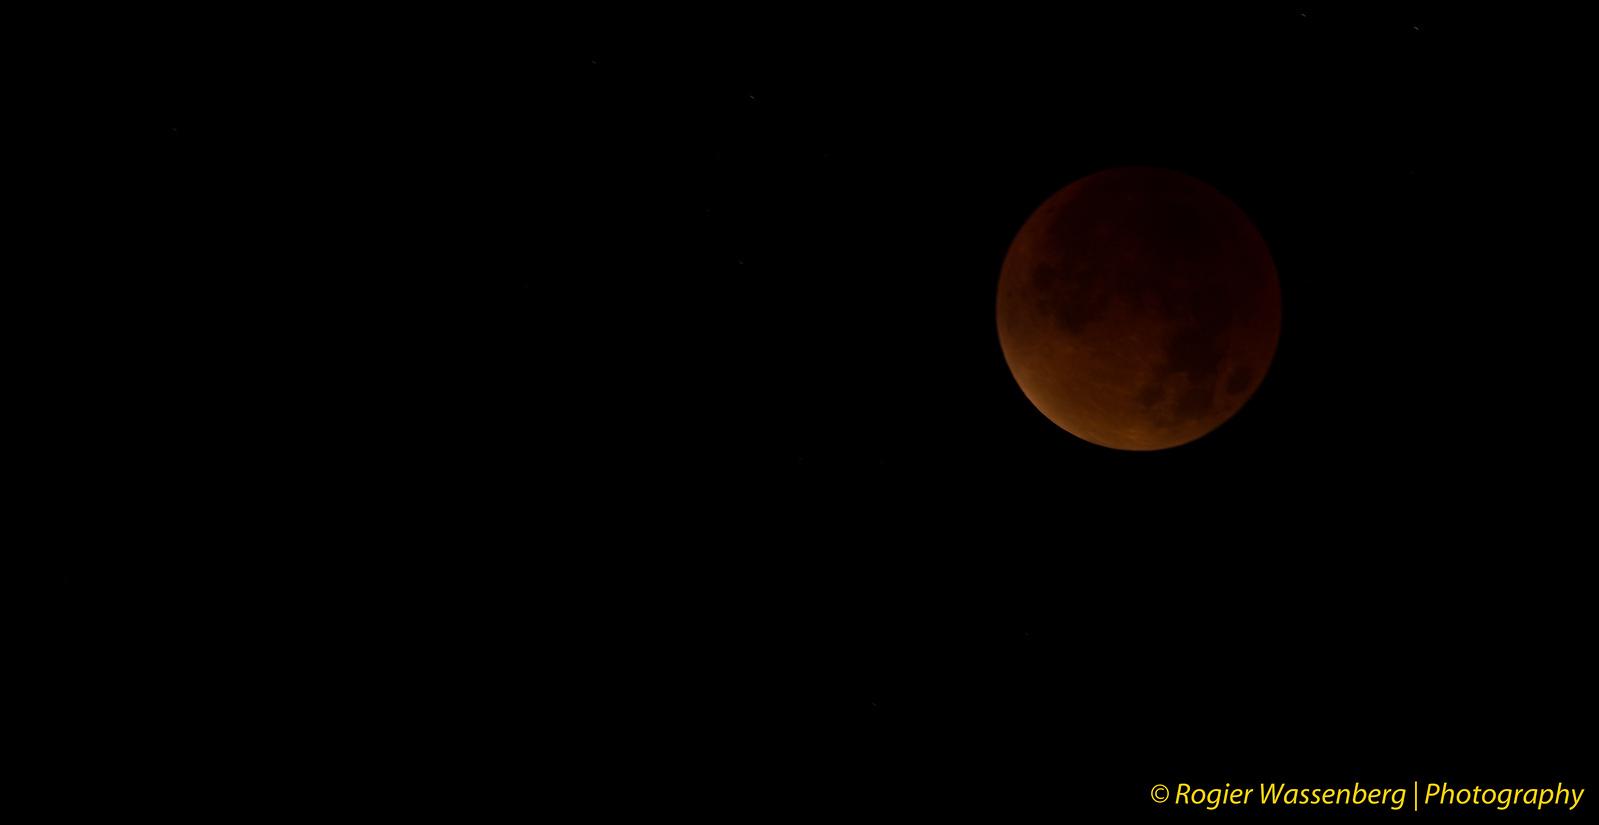 Eclipse on its maximum